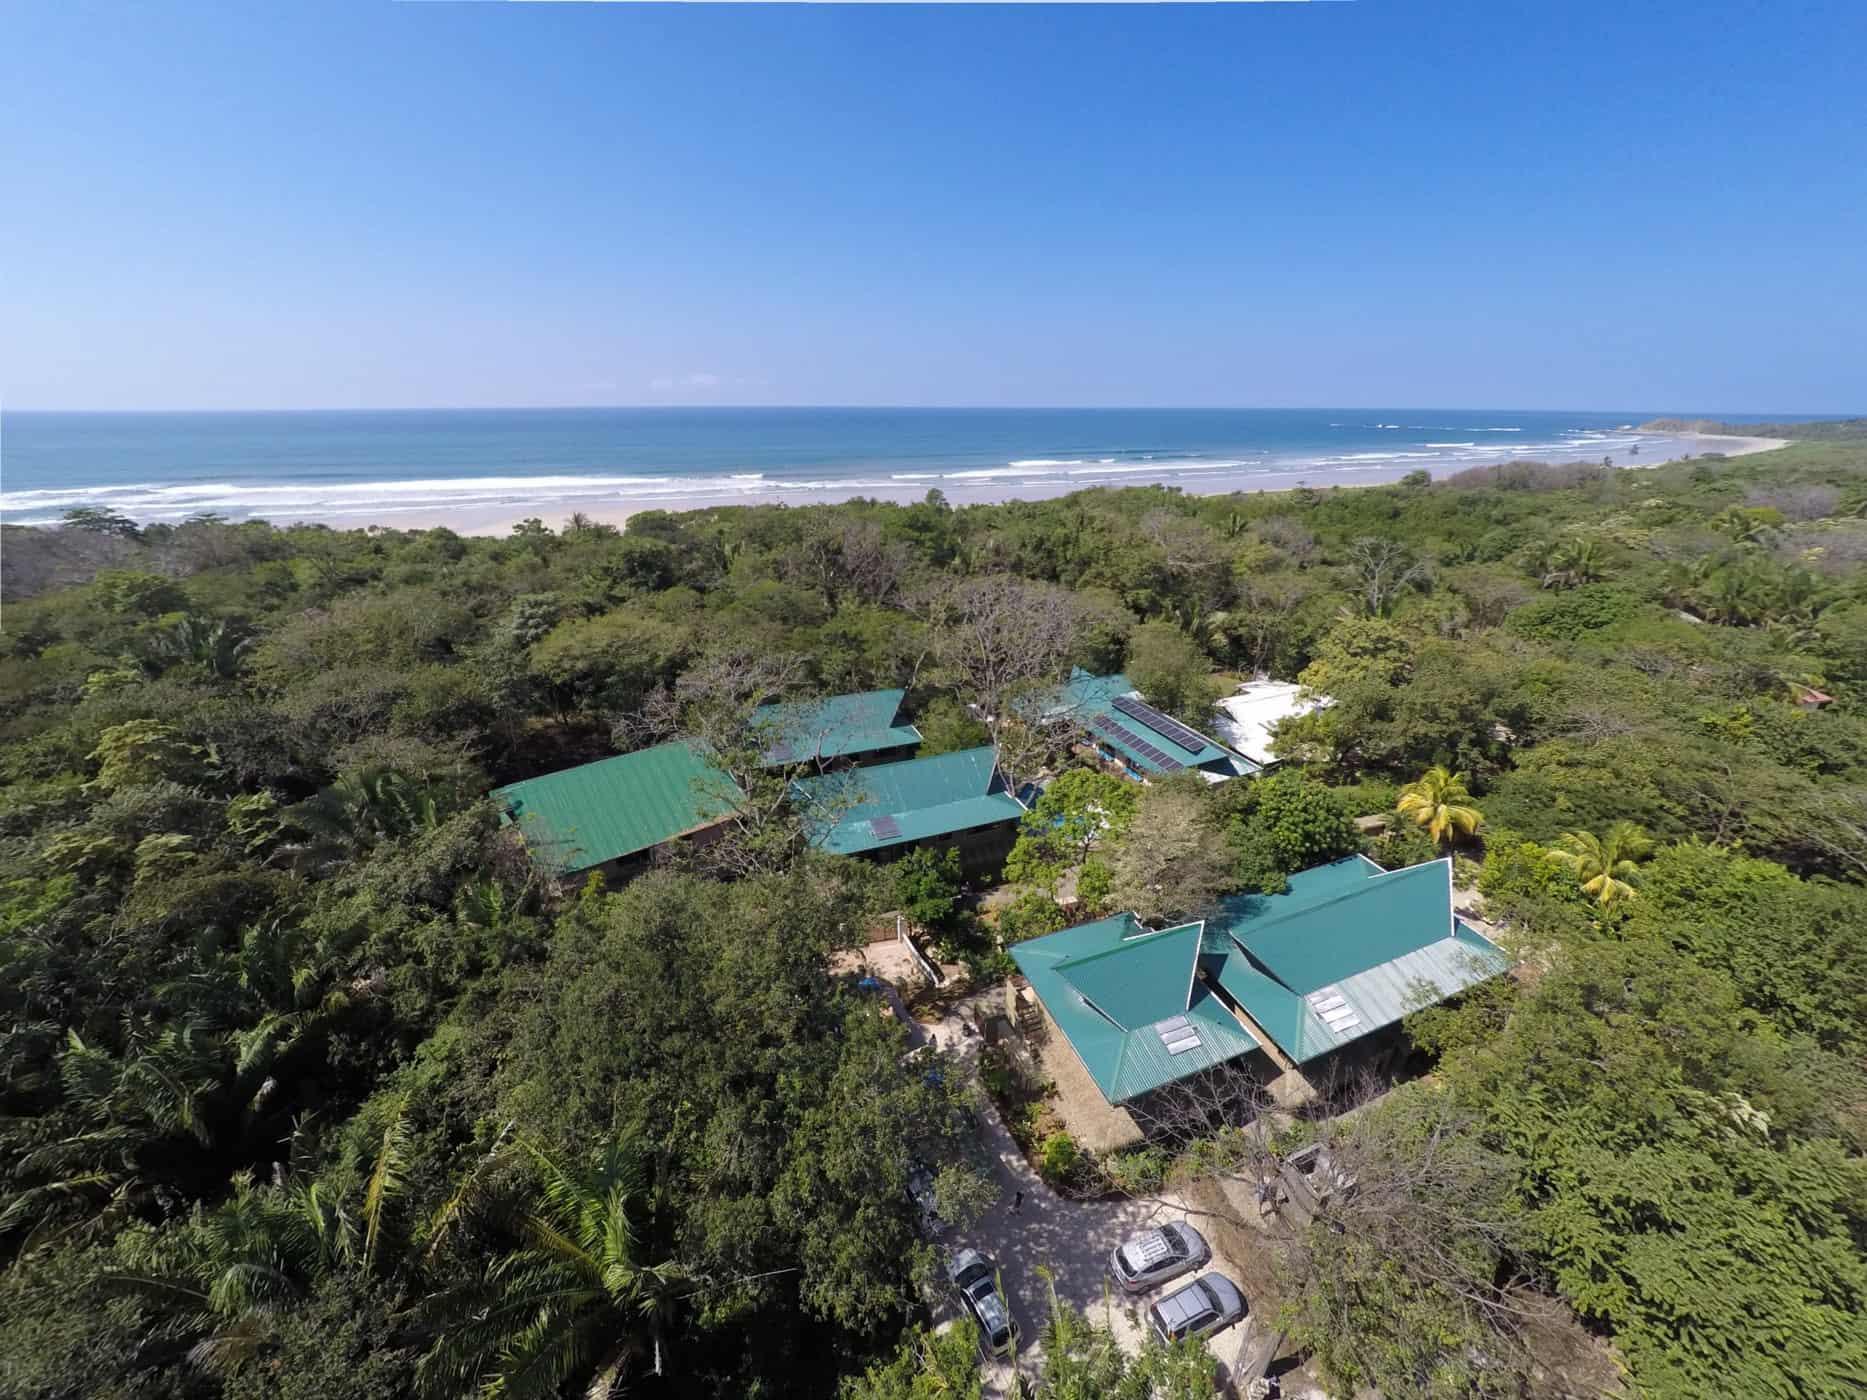 Olas Verdes Hotel in Costa Rica